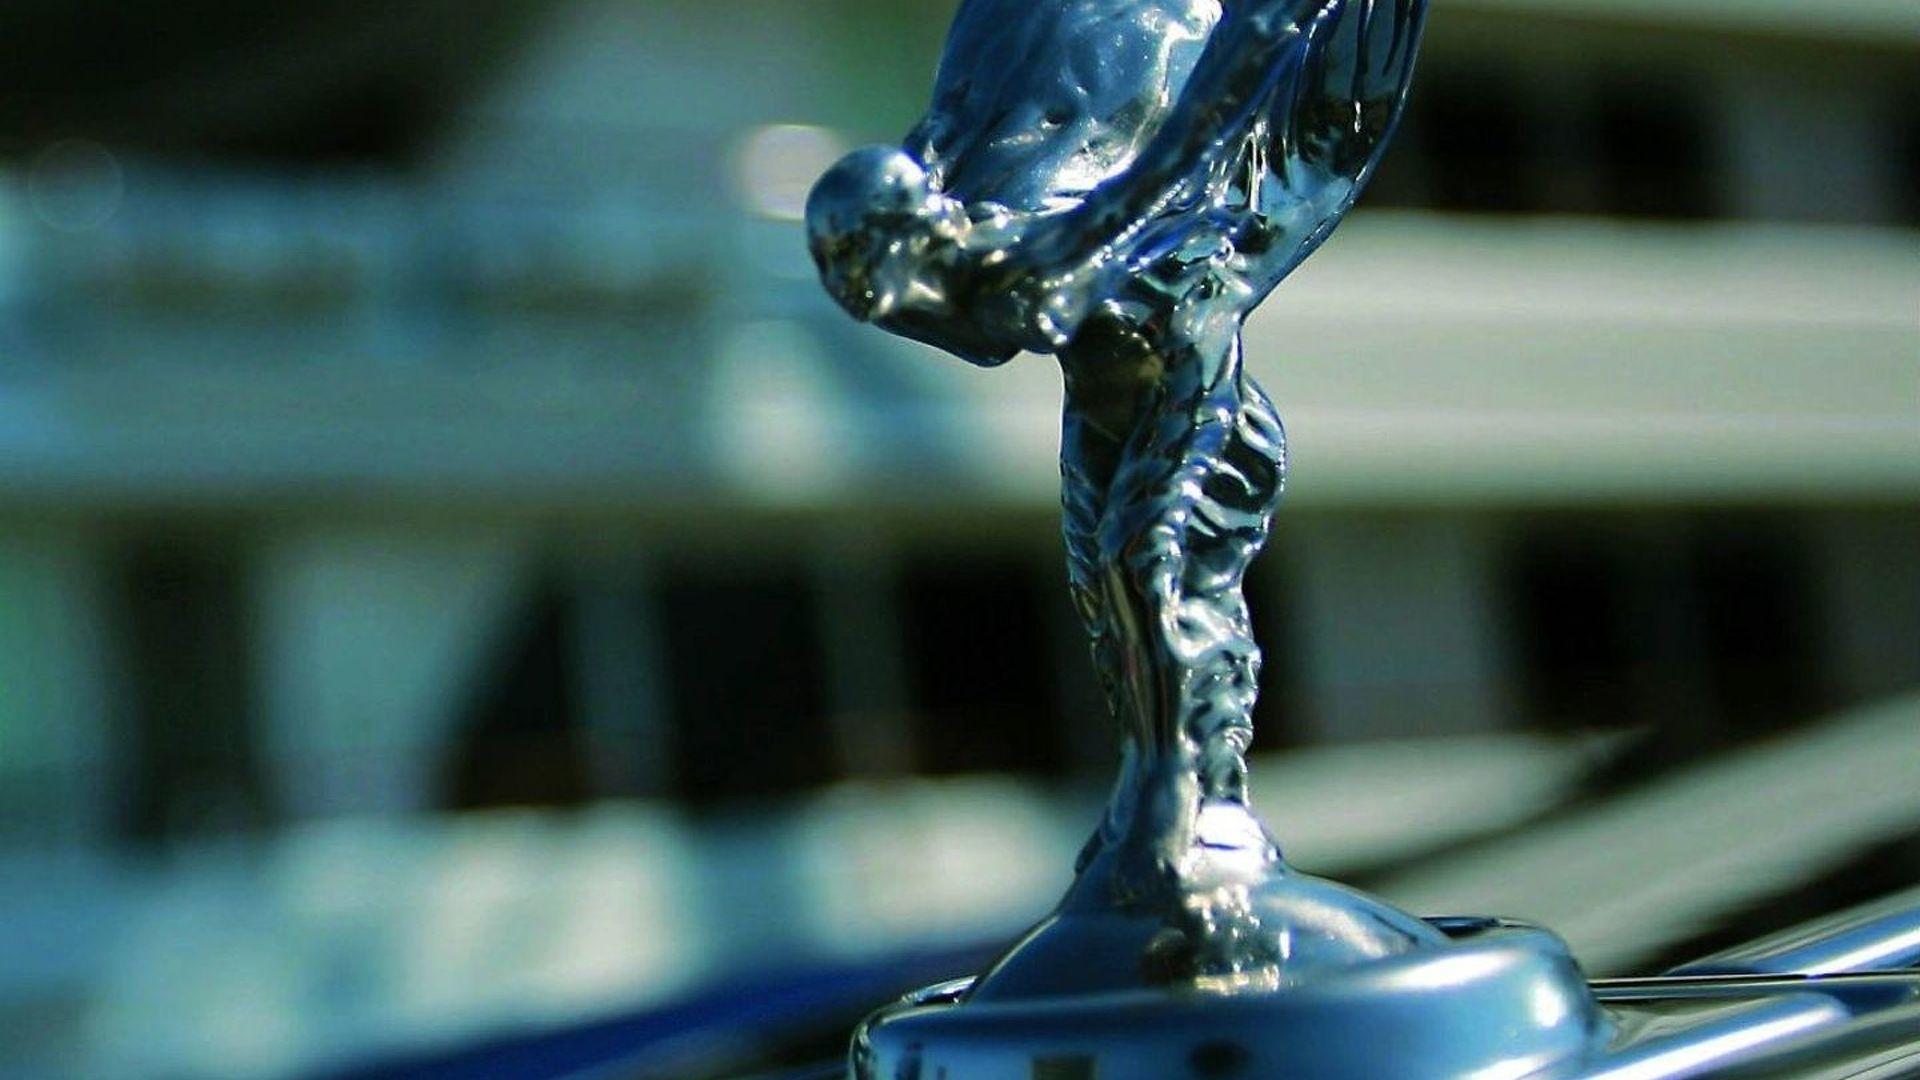 Baby Rolls-Royce Confirmed for 2010